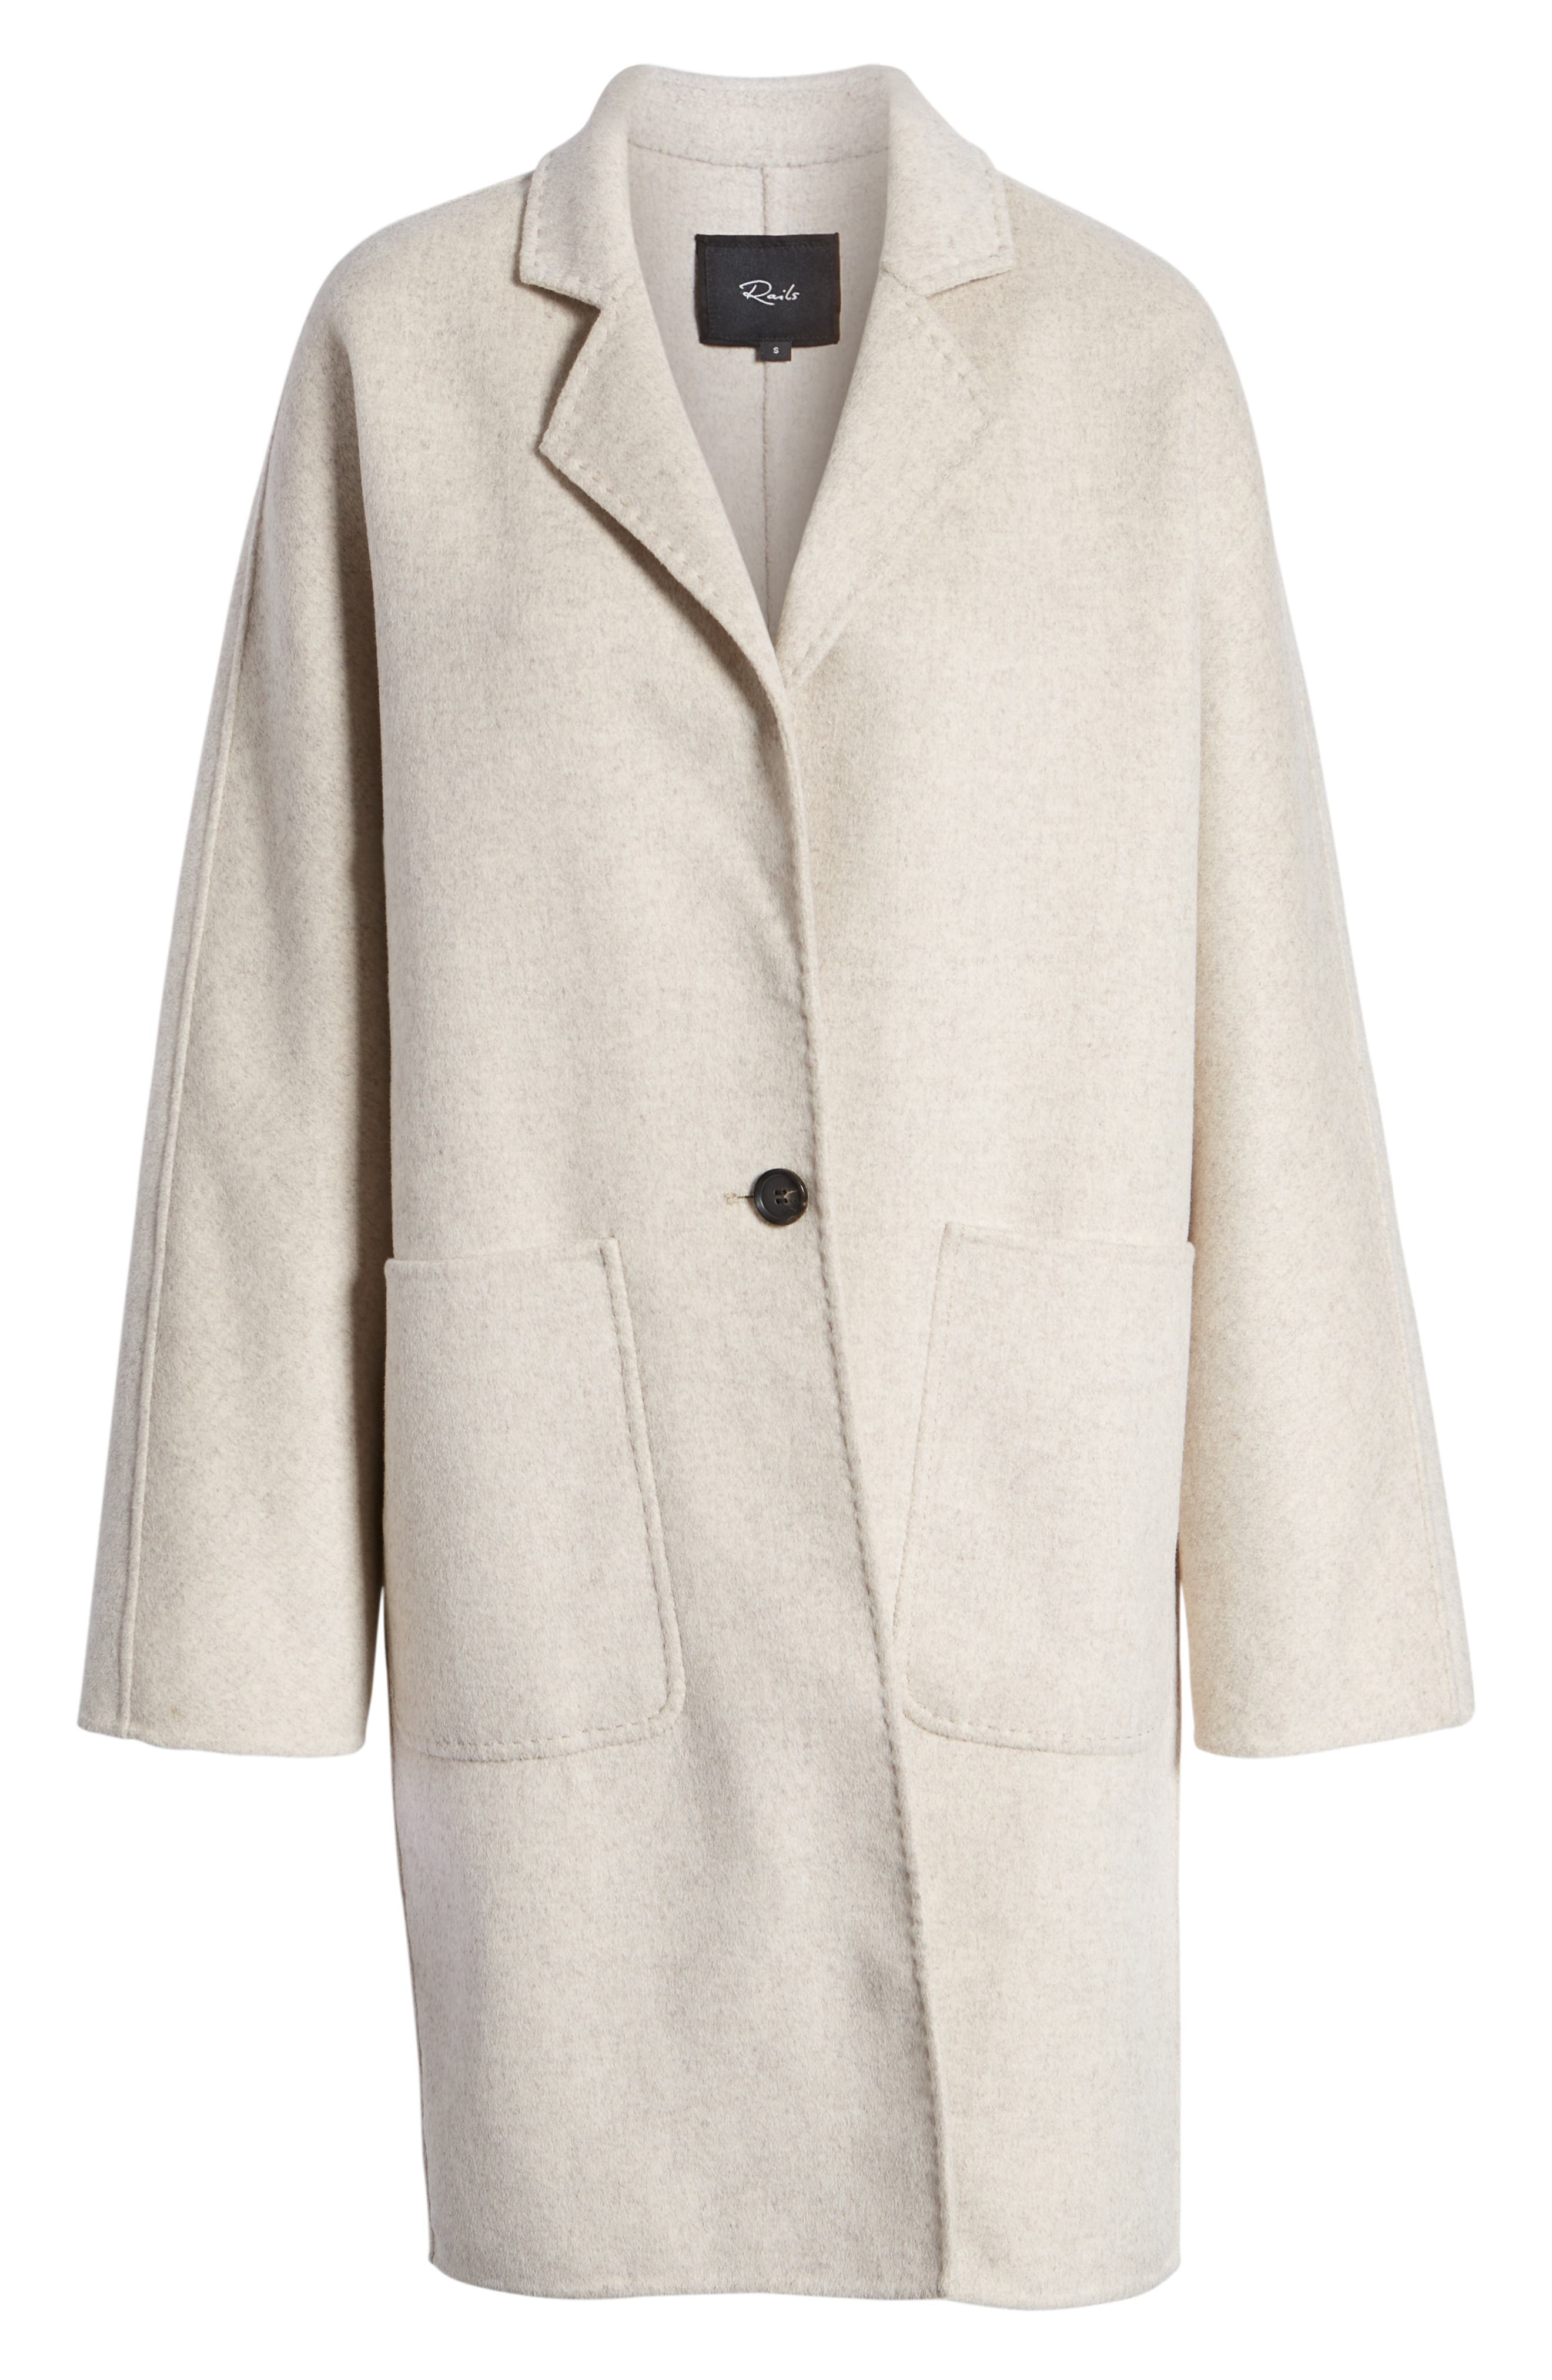 Everest Wool Blend Coat,                             Alternate thumbnail 7, color,                             905